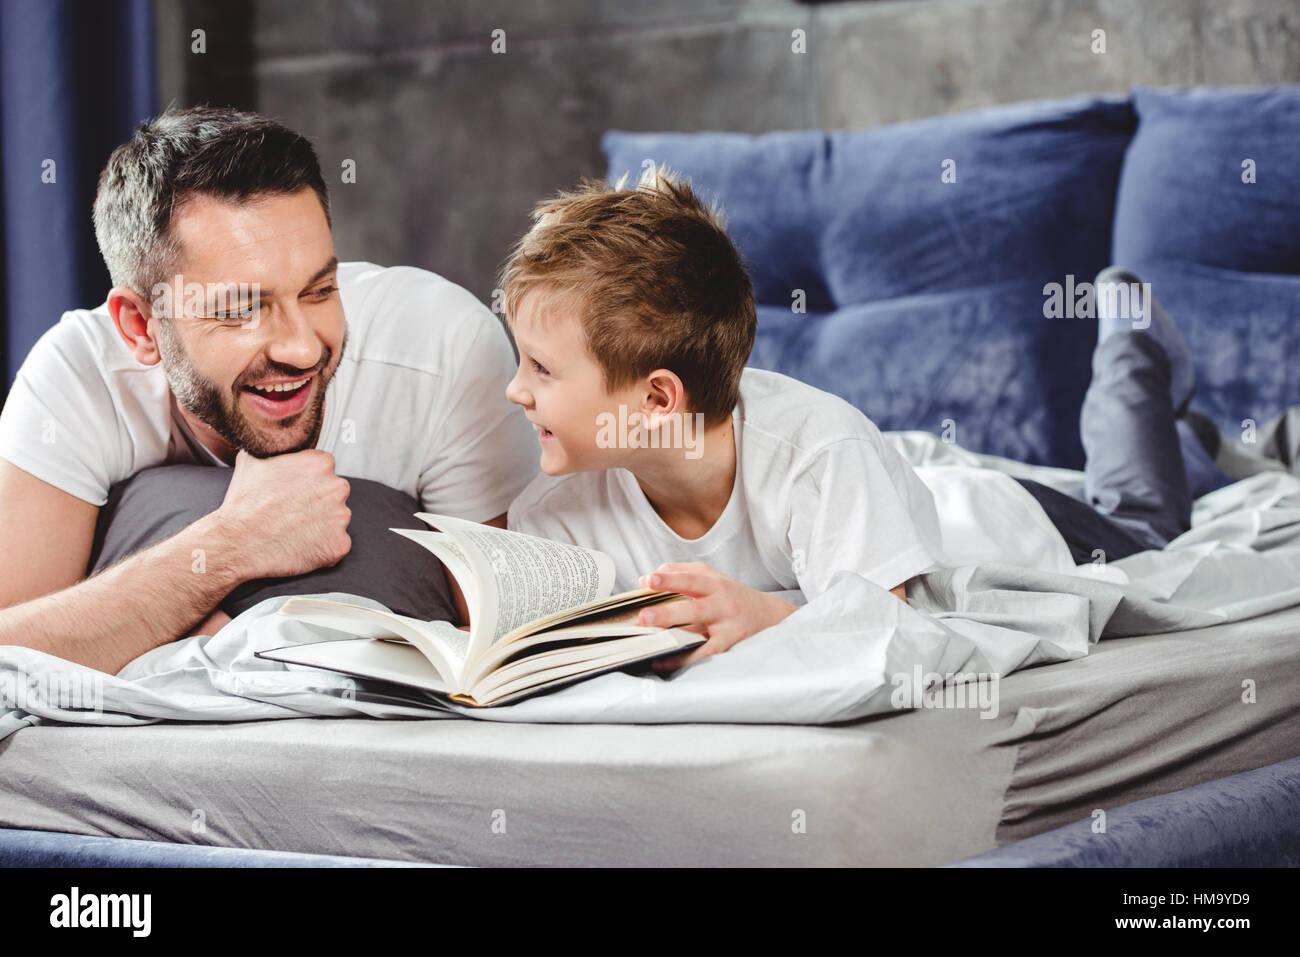 Vater und Sohn-Lesebuch Stockfoto